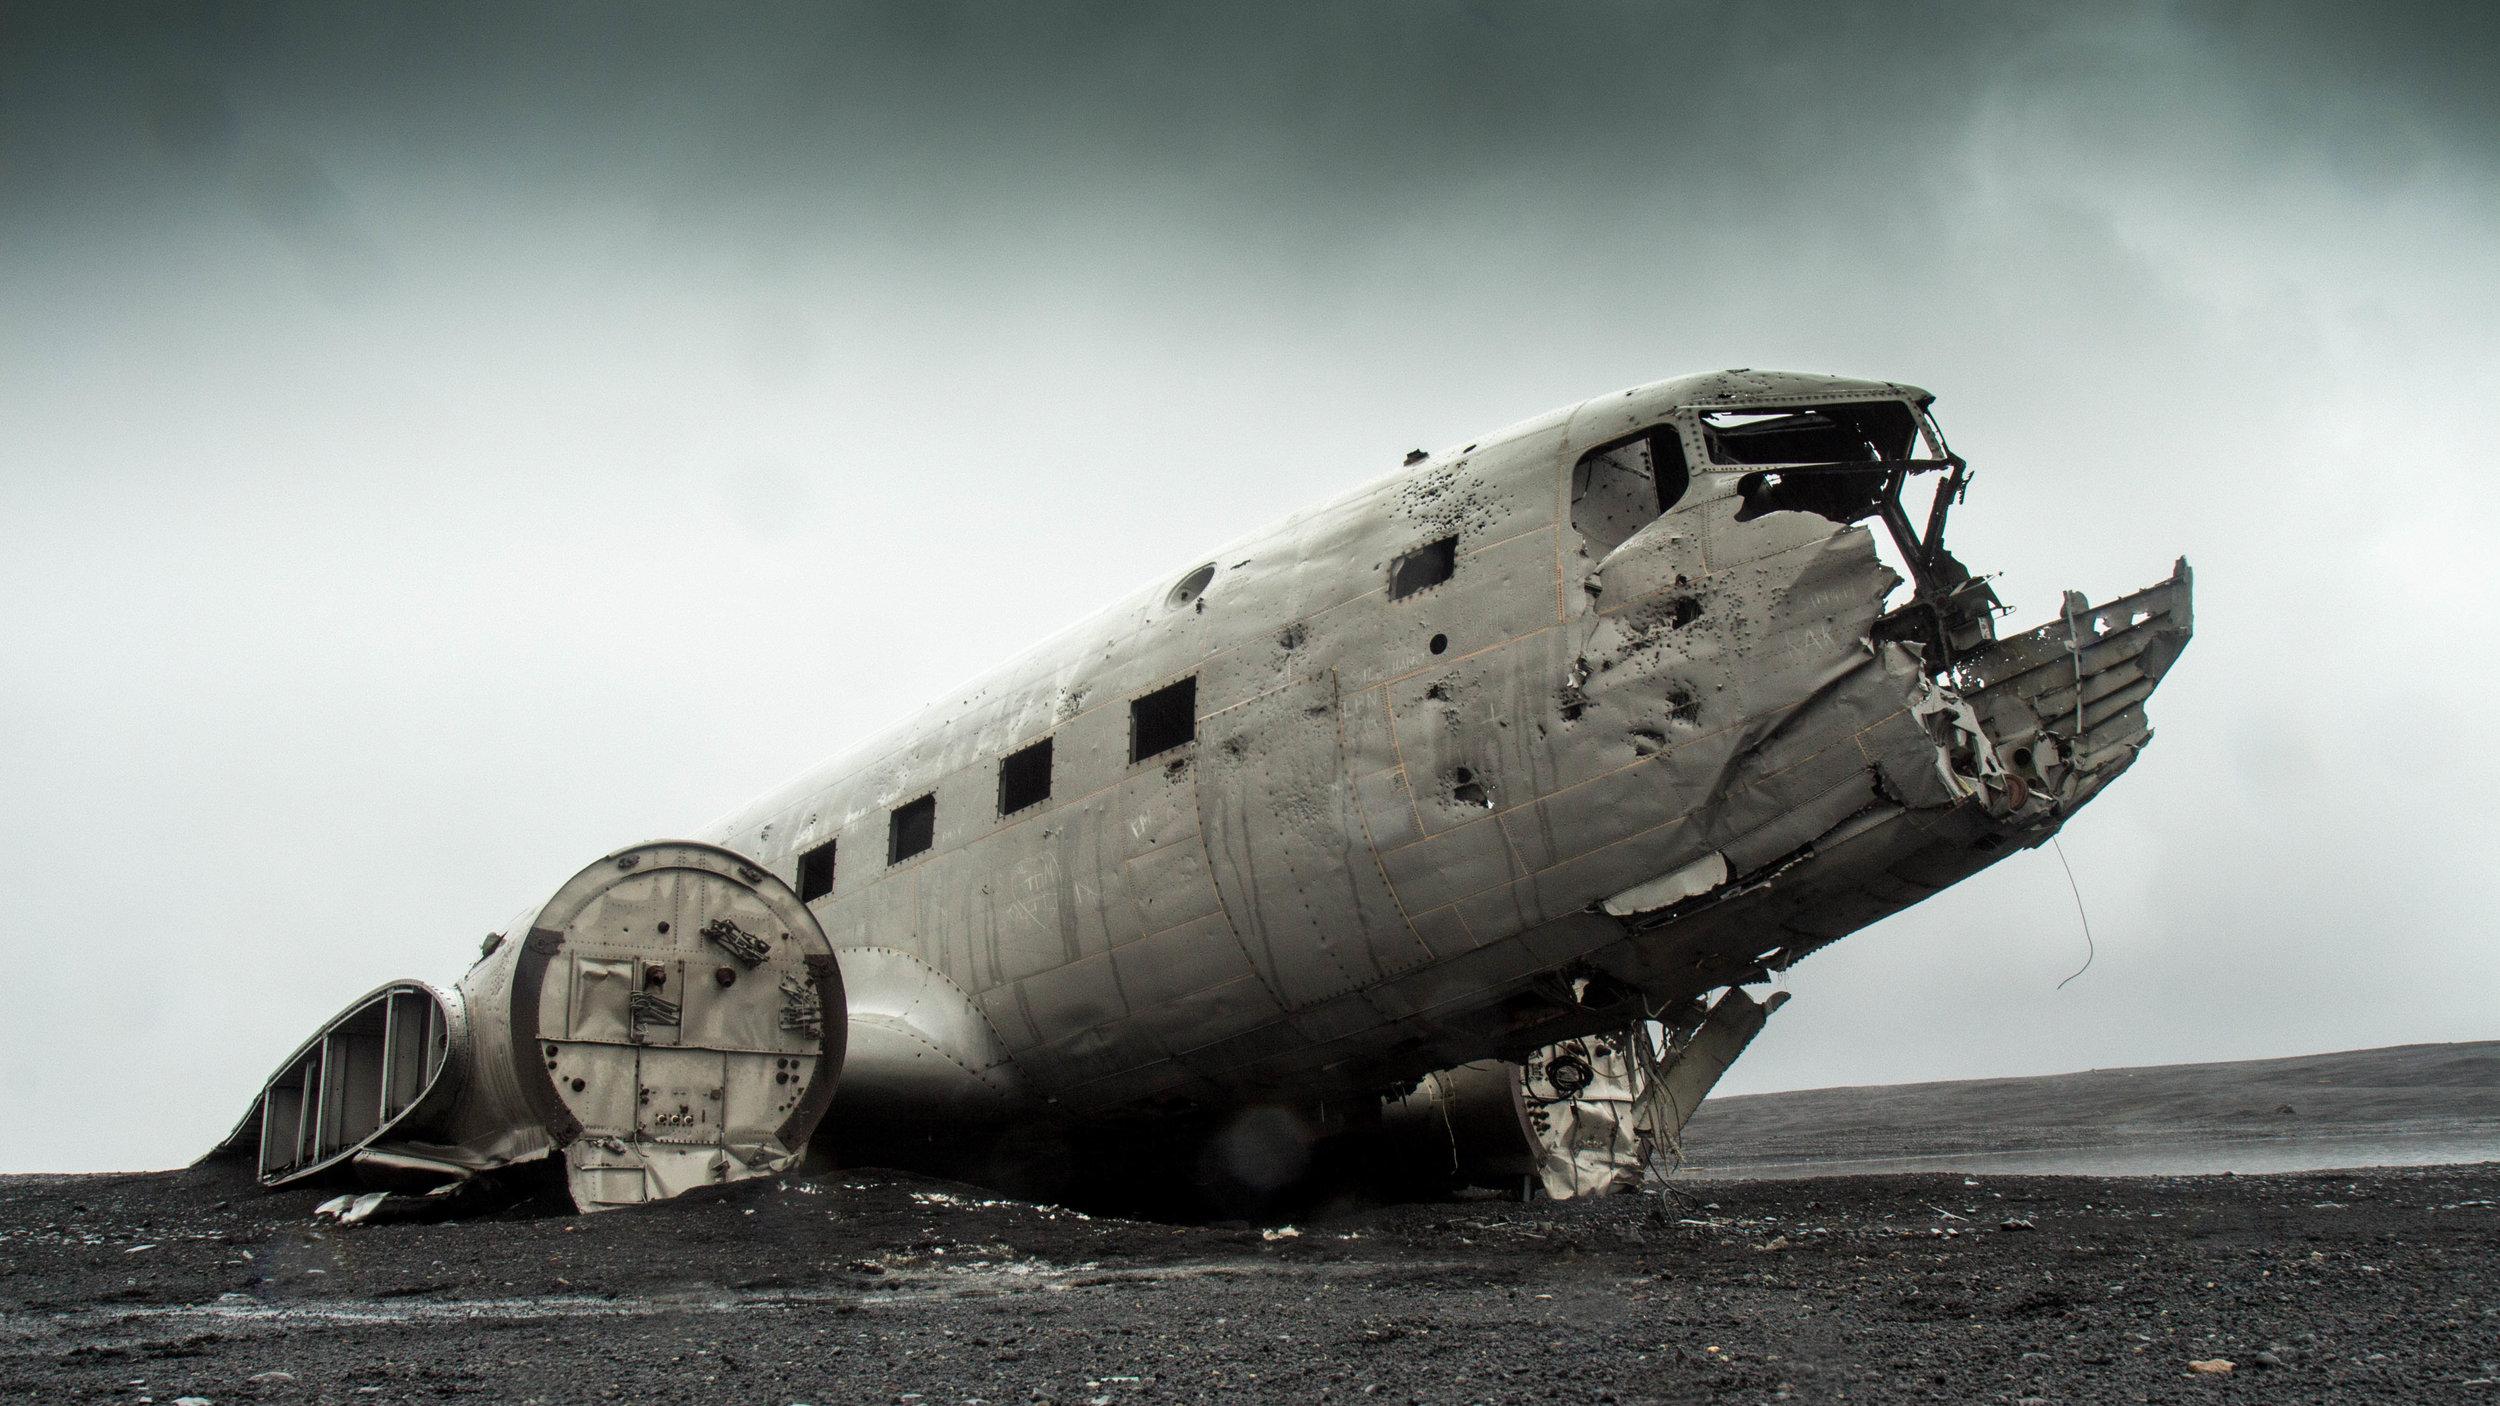 vintage-grey-airplane-plane-CC0-license.jpg